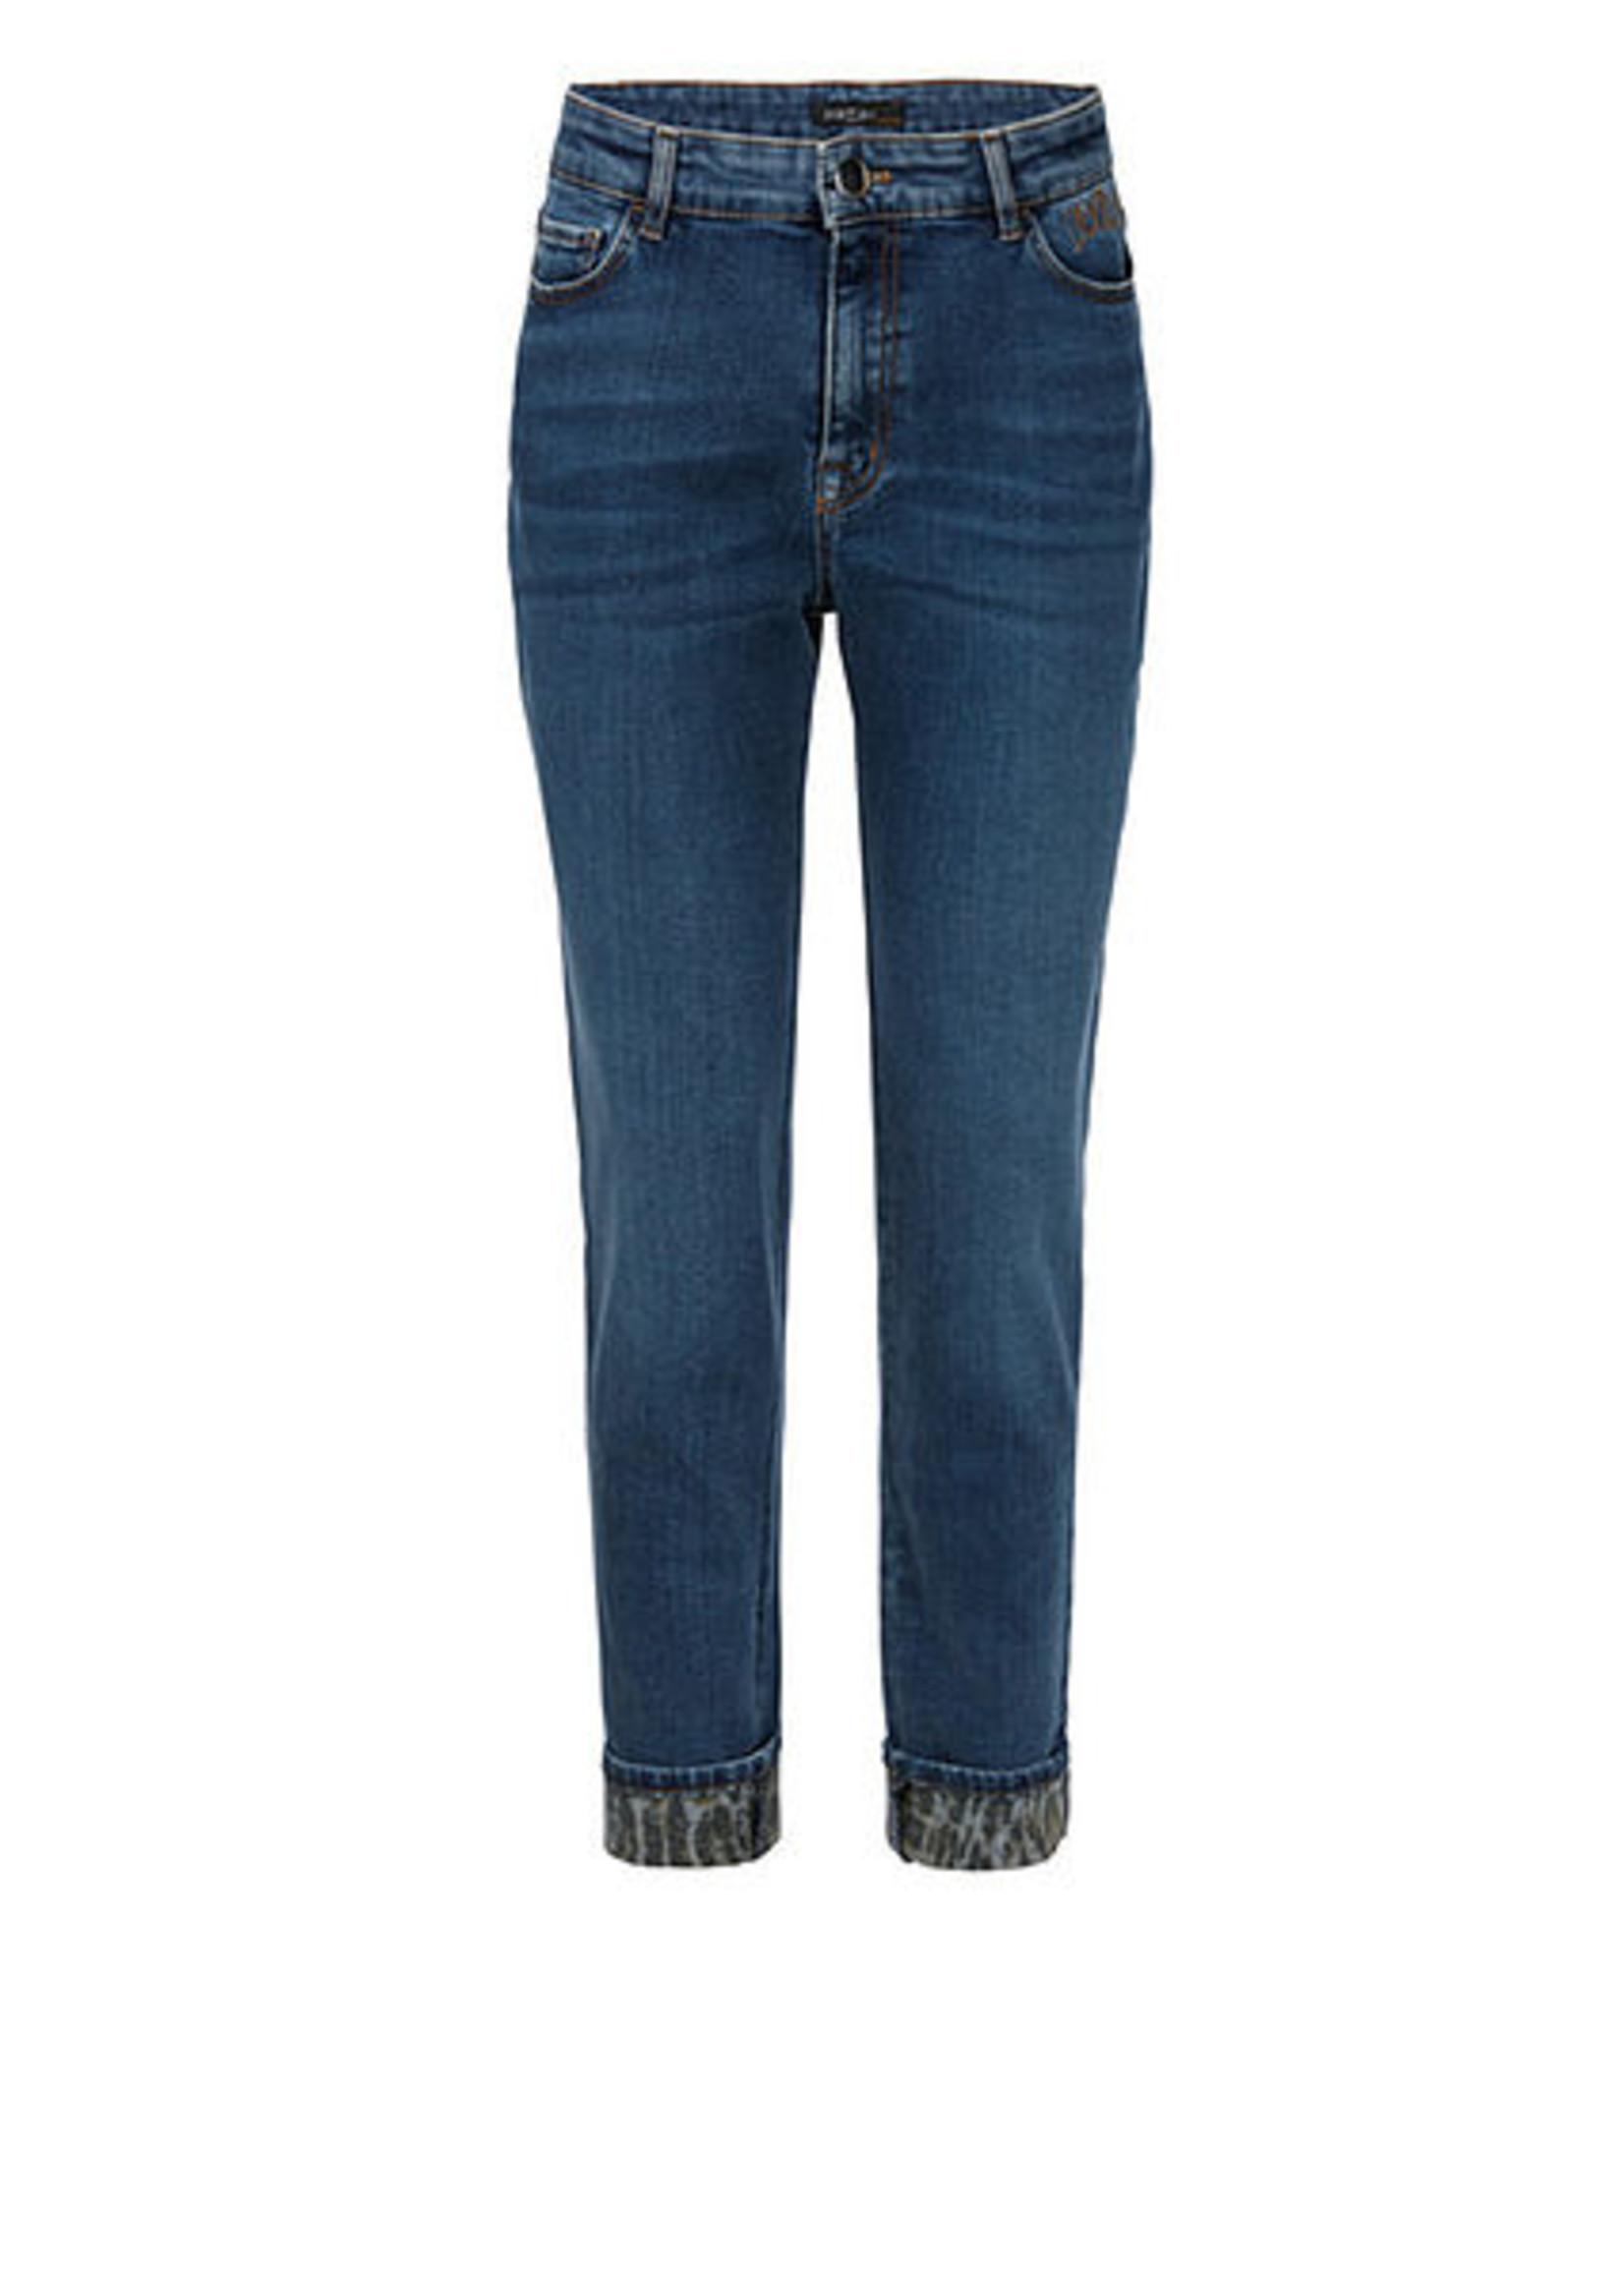 Marccain Sports Jeans RS 82.15 D79 blue denim